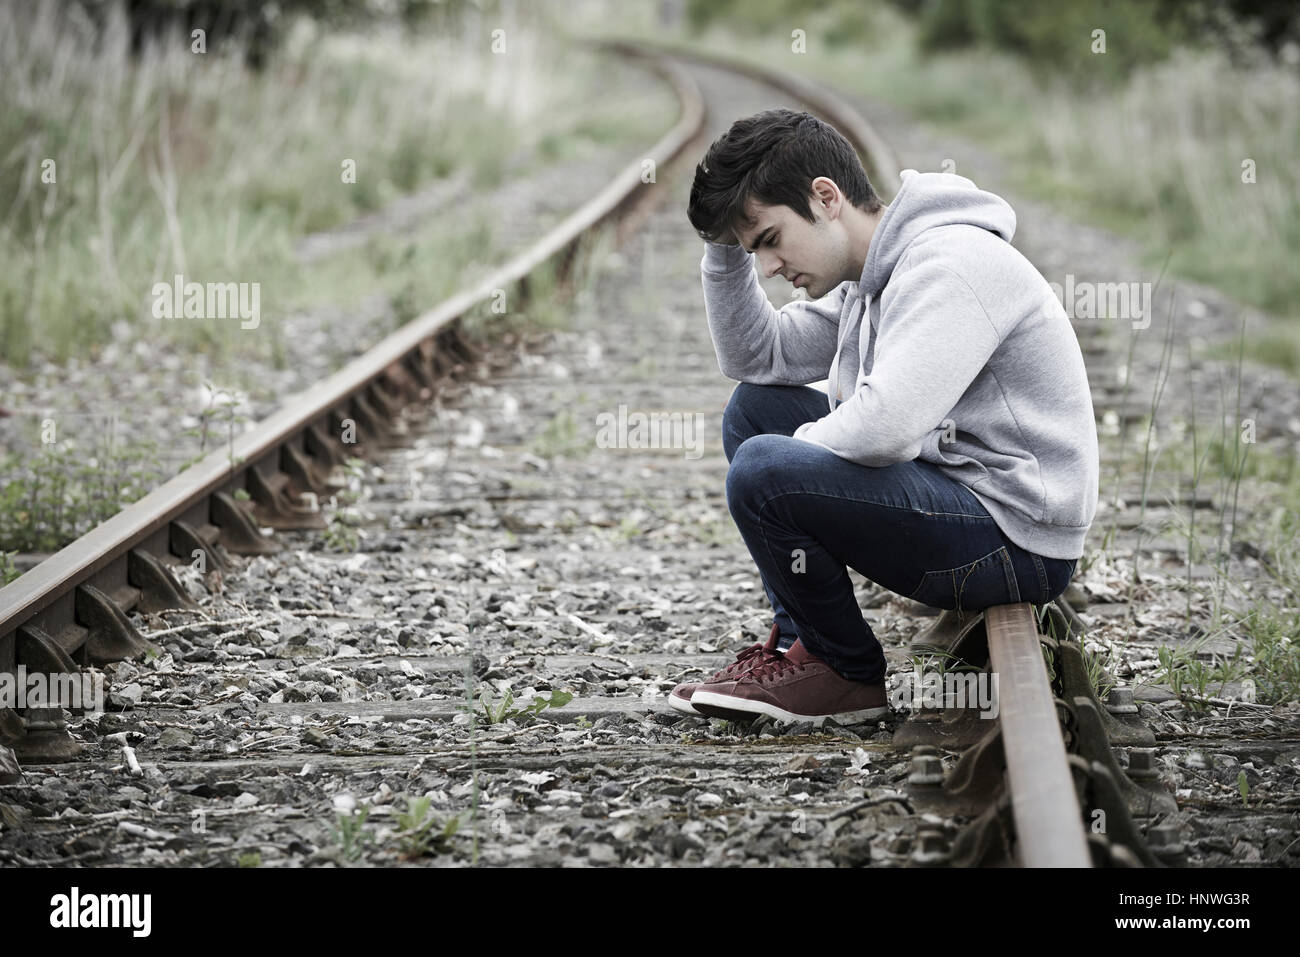 Suicidal Depression Stock Photos Amp Suicidal Depression